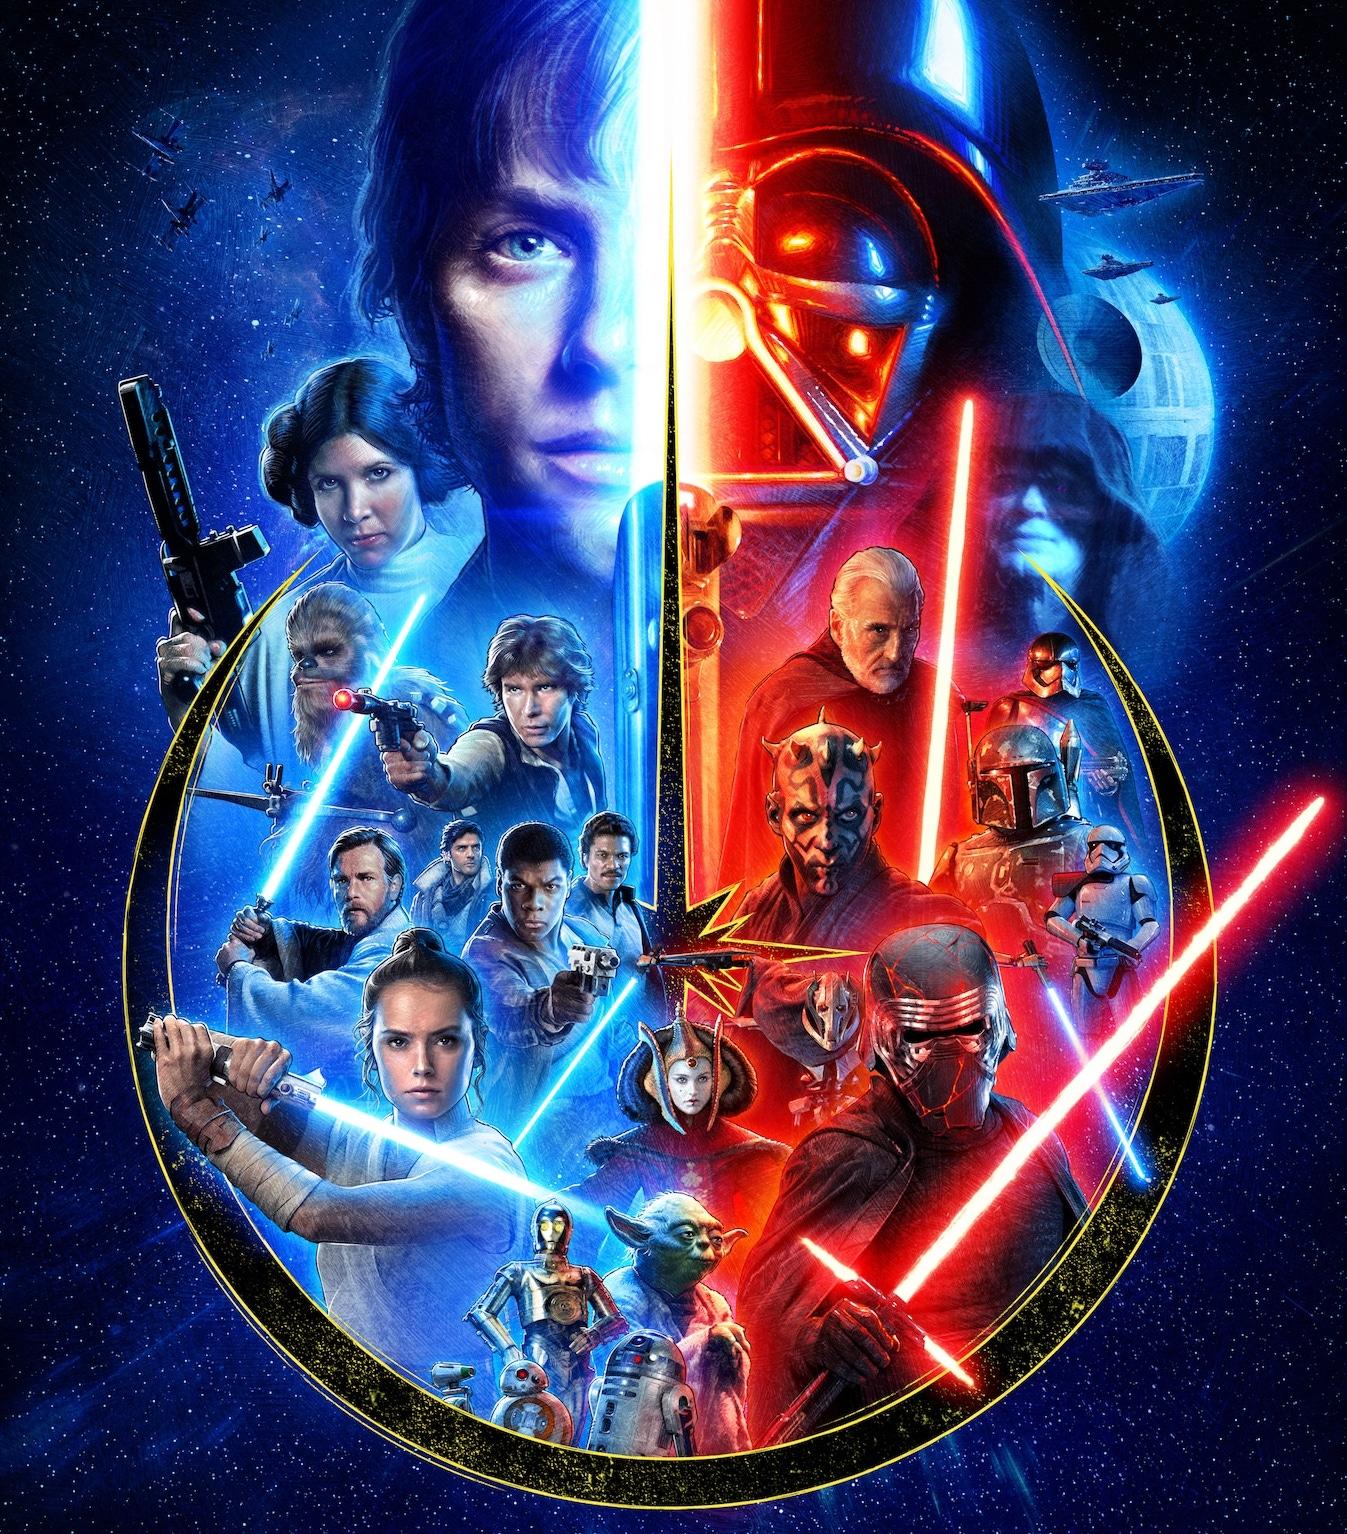 Art from Star Wars' complete Skywalker Saga.